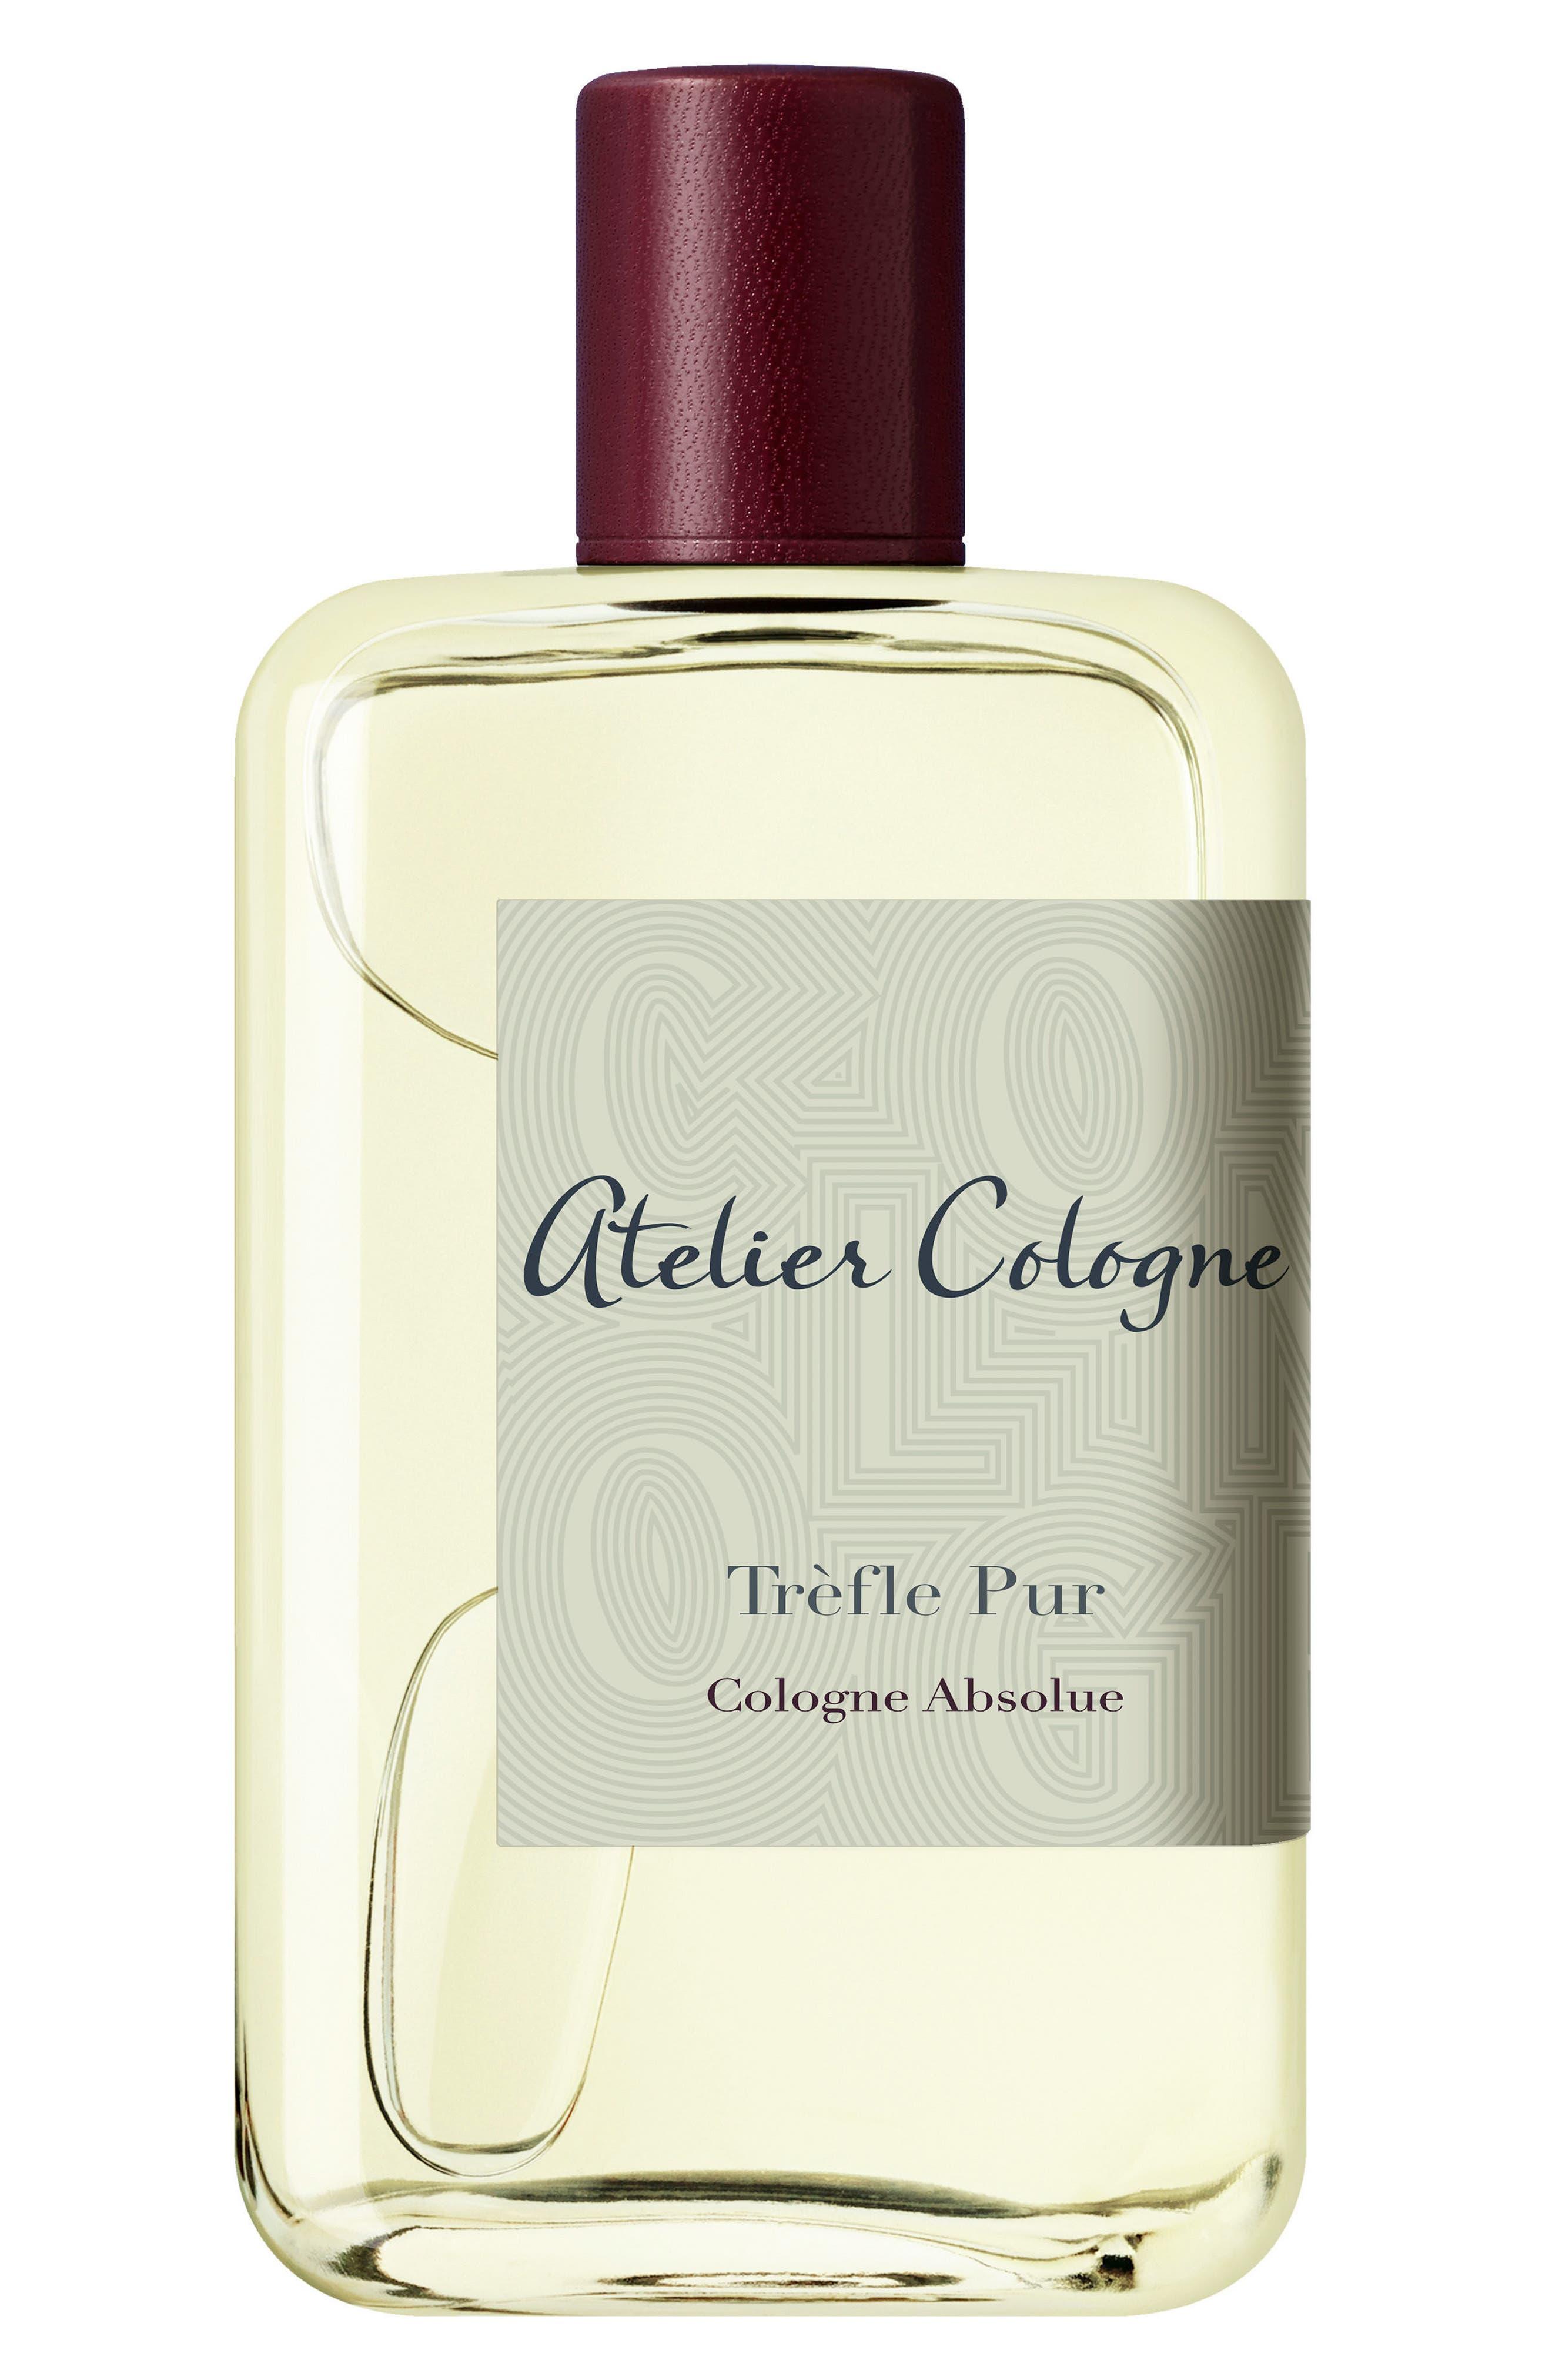 Atelier Cologne Trèfle Pur Cologne Absolue